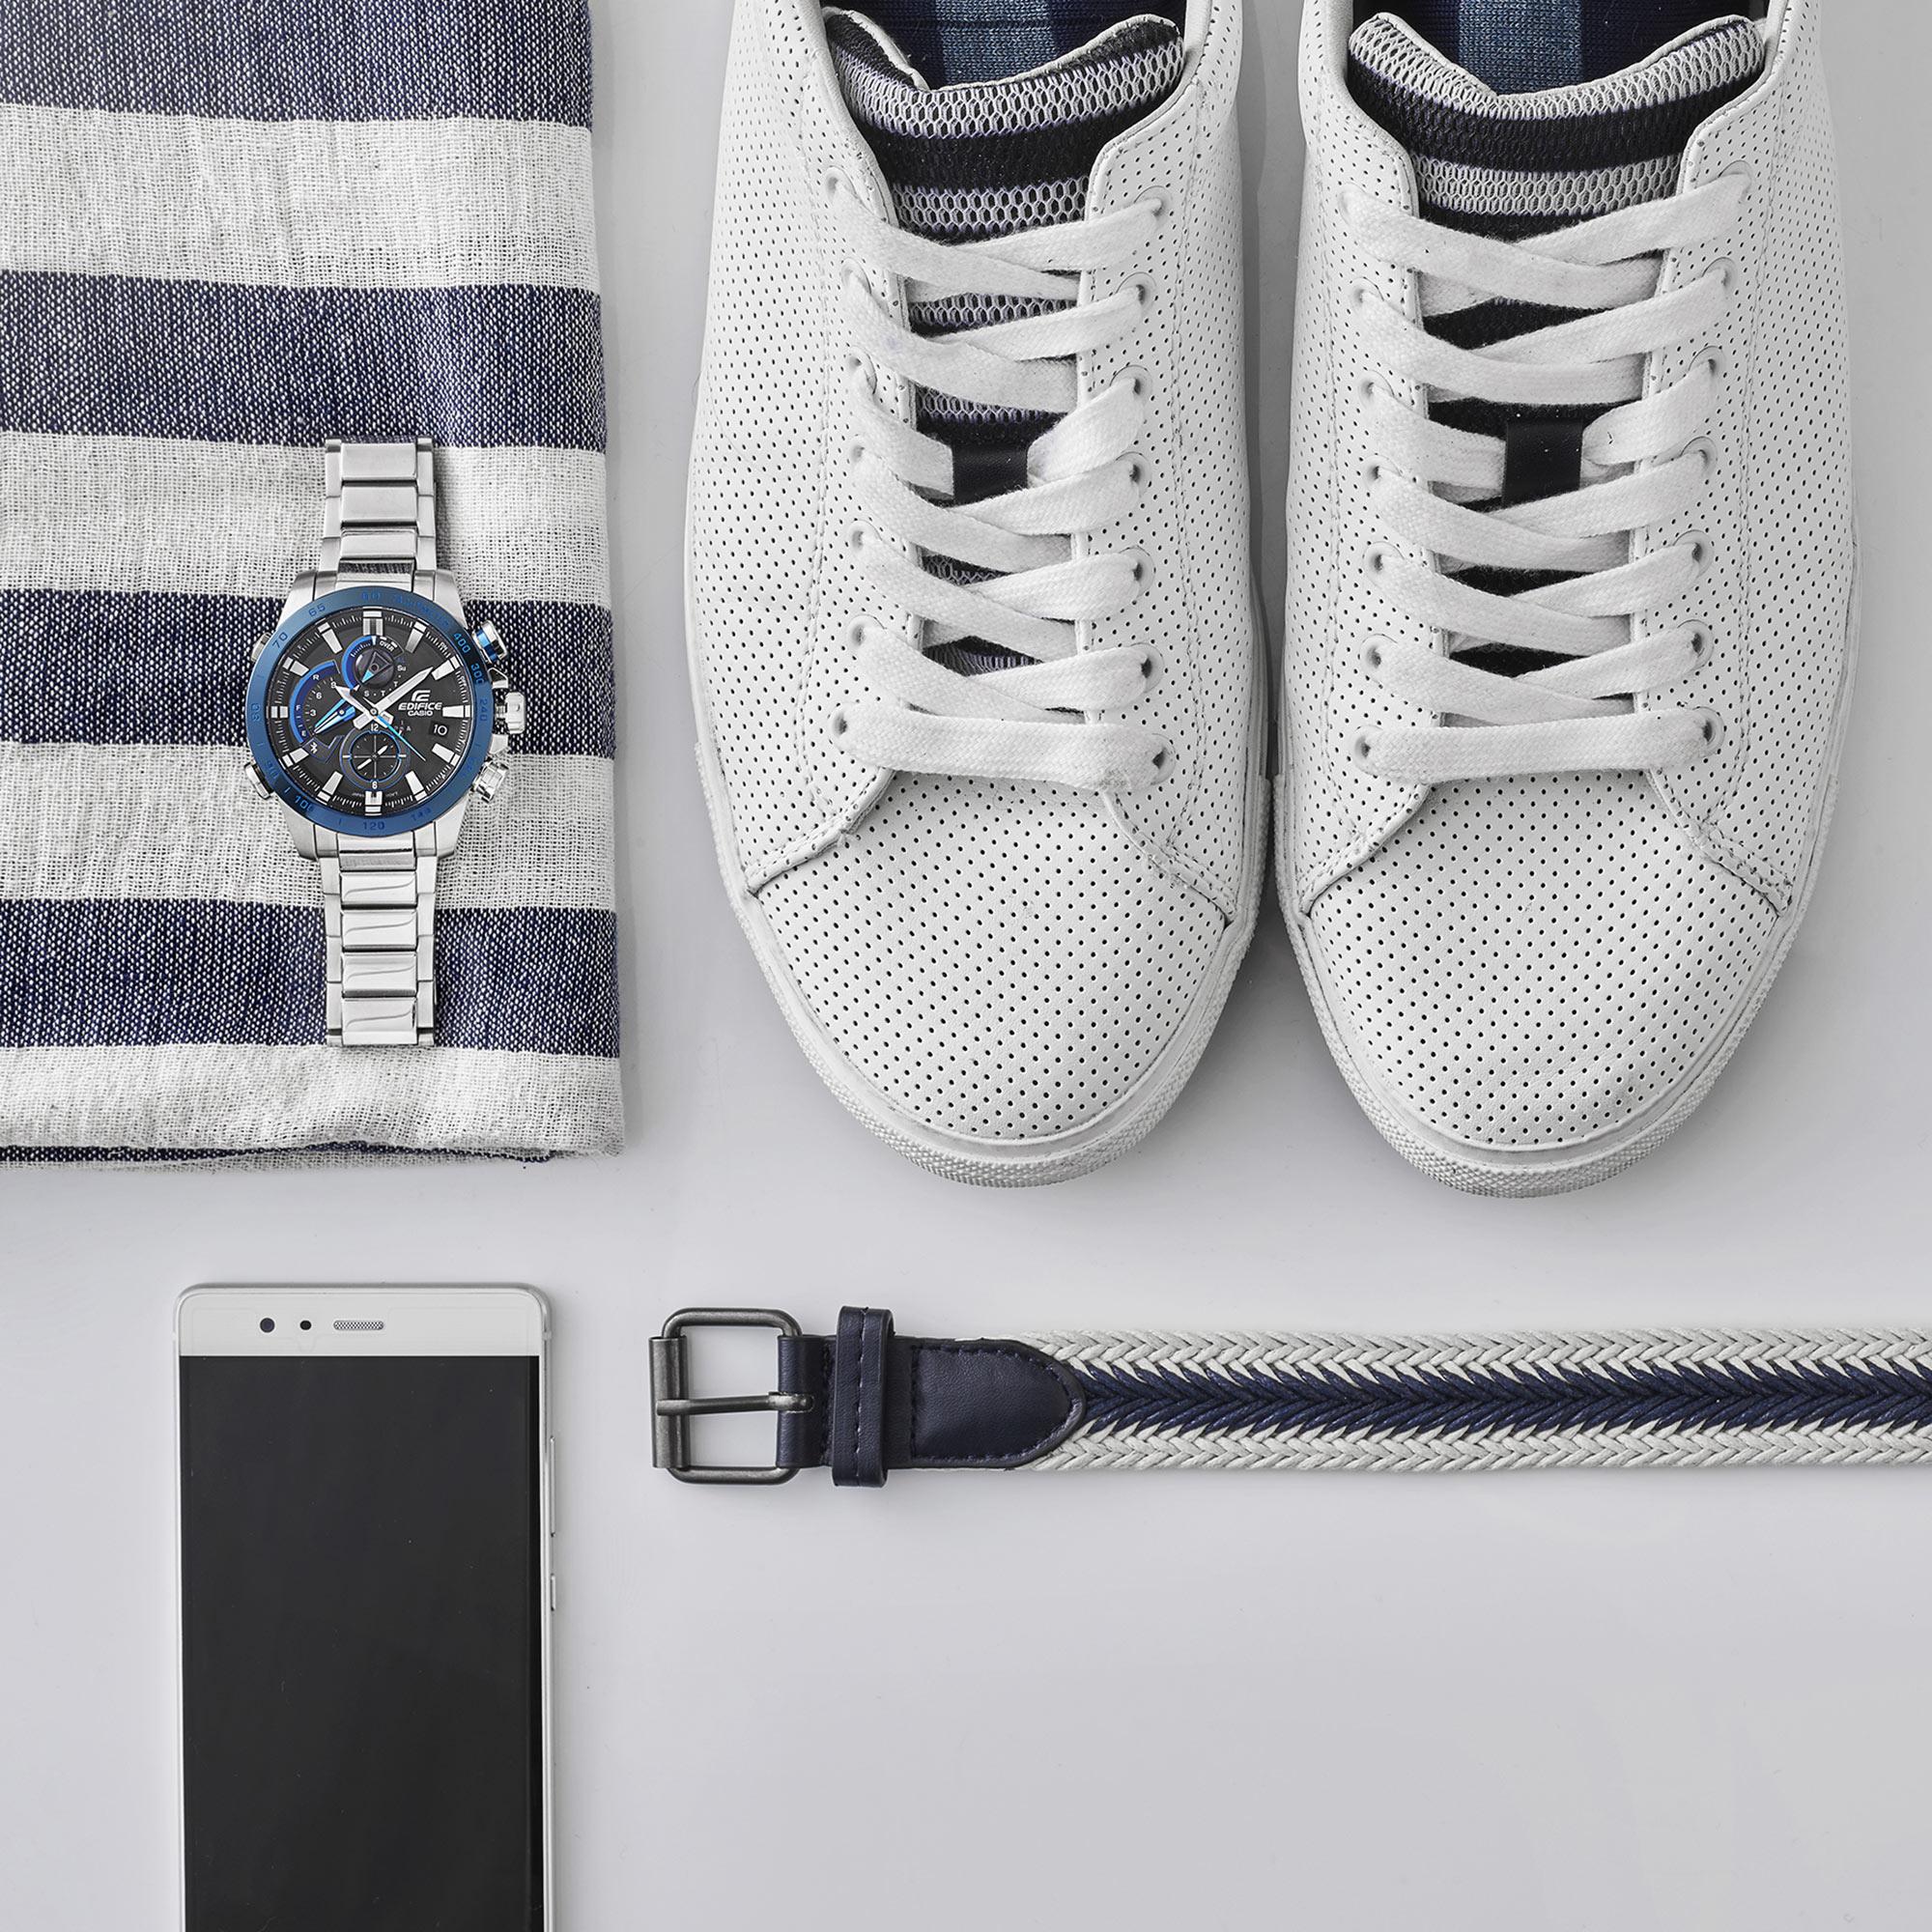 Man White Shoes Belt Smartphone Still Life Shot for Casio by Fotografando